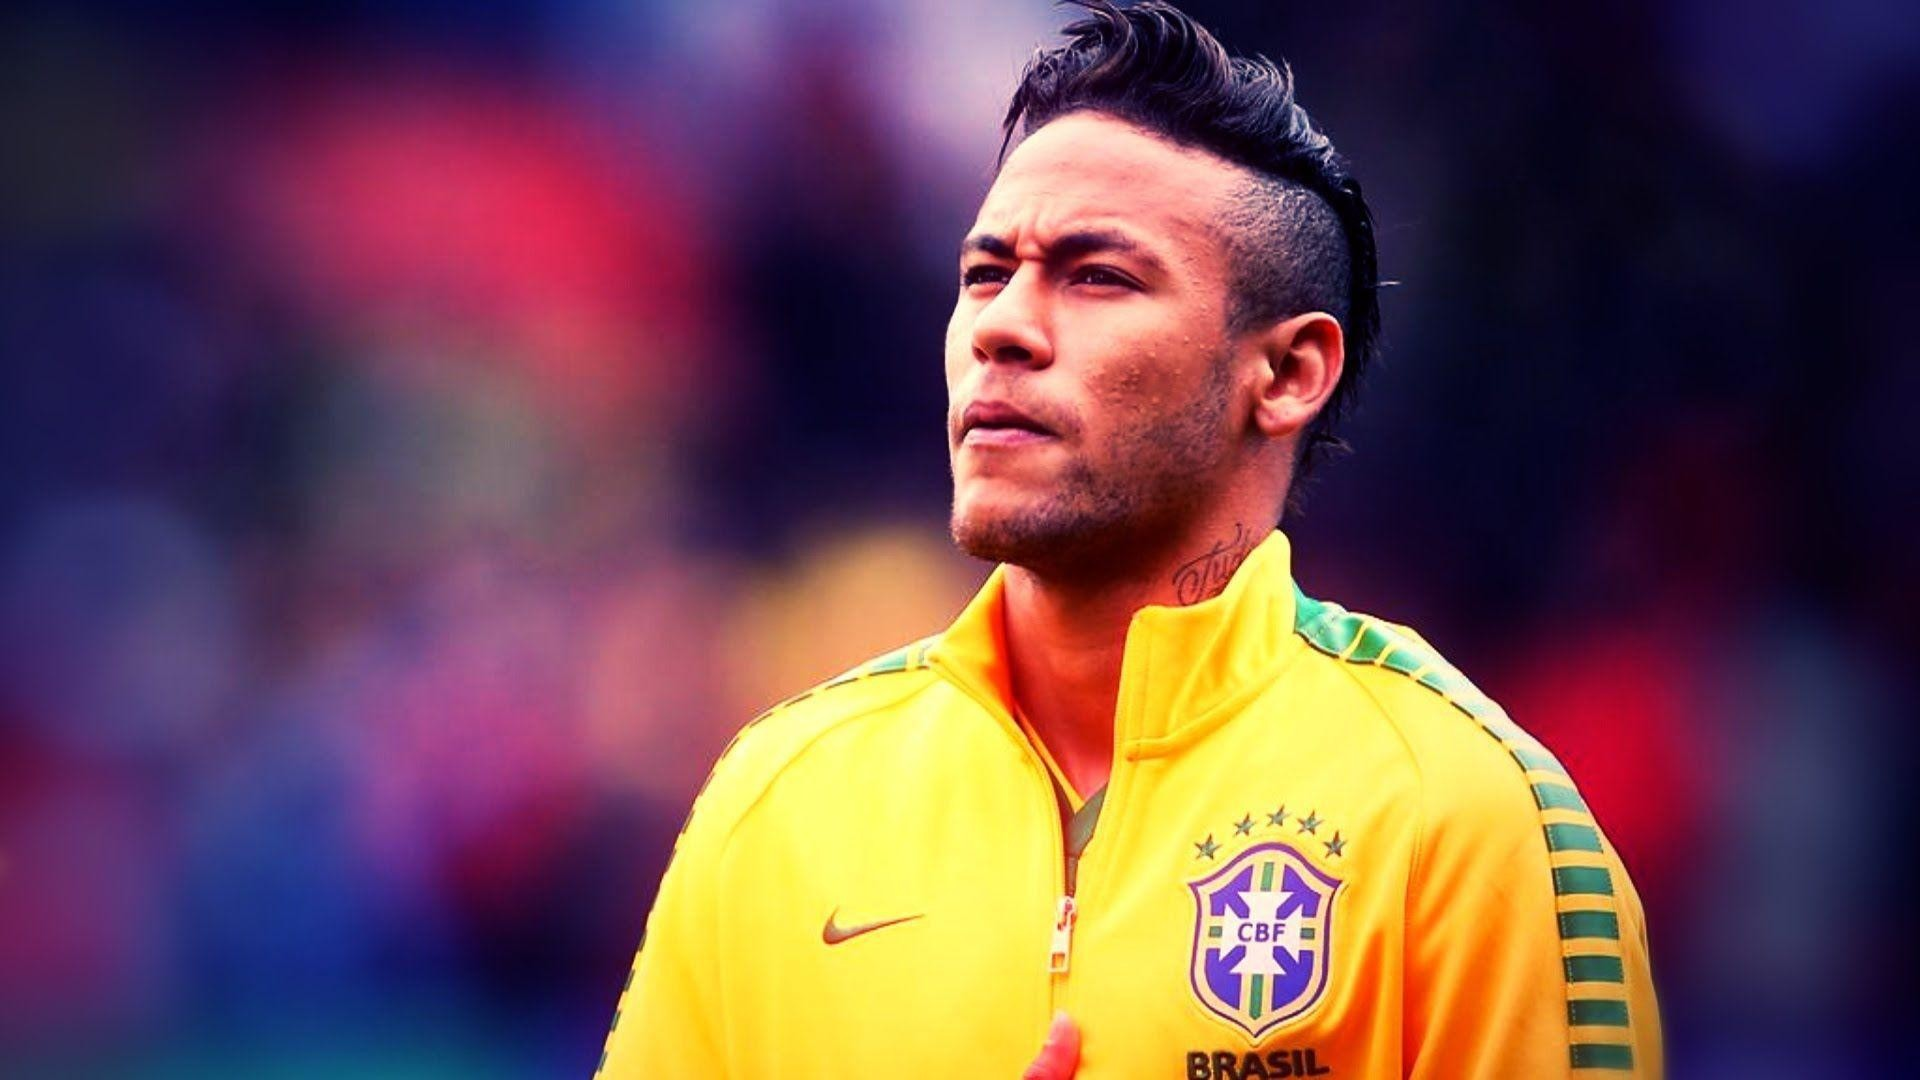 Neymar brazil wallpaper 2018 hd wallpapertag - Neymar brazil hd ...